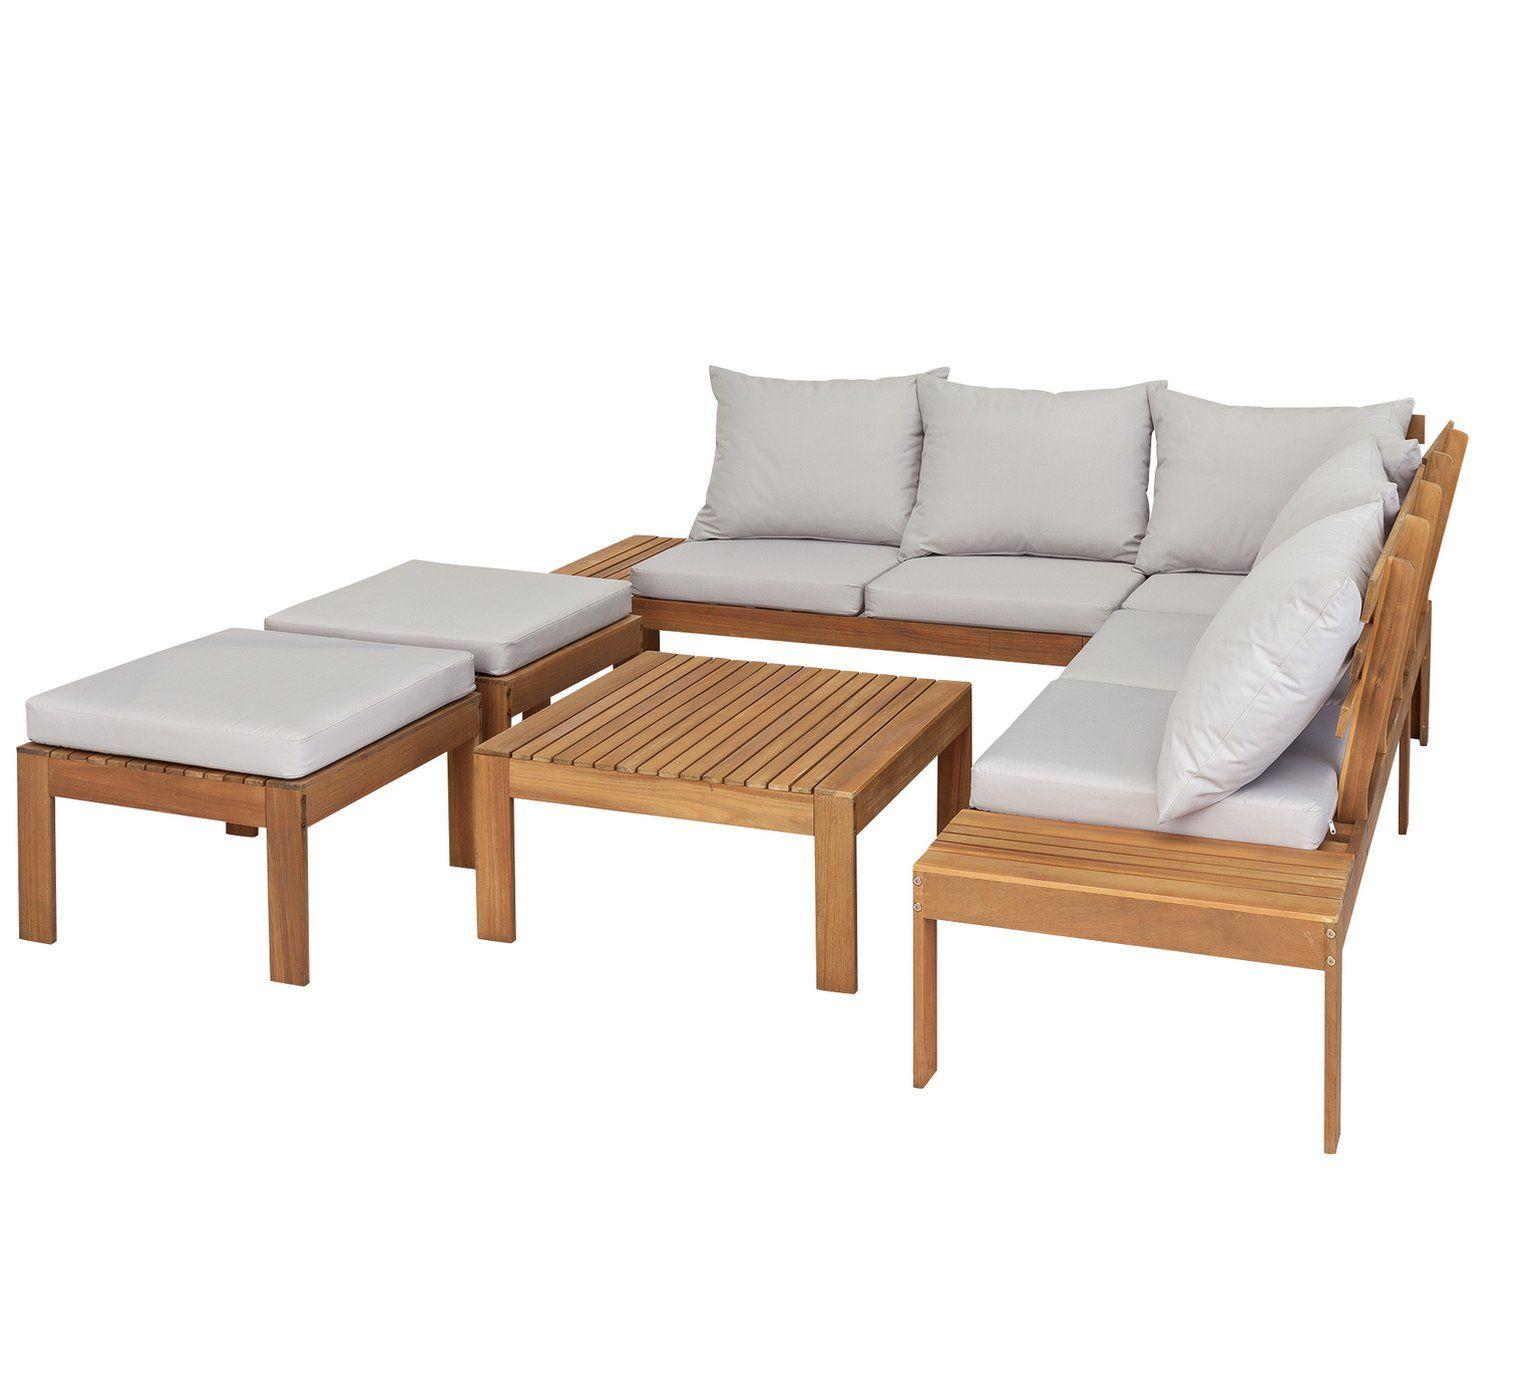 Buy Argos Home 6 Seater Wooden Corner Sofa Set Patio Sets Argos Corner Sofa Set Corner Sofa Garden Wooden Garden Furniture